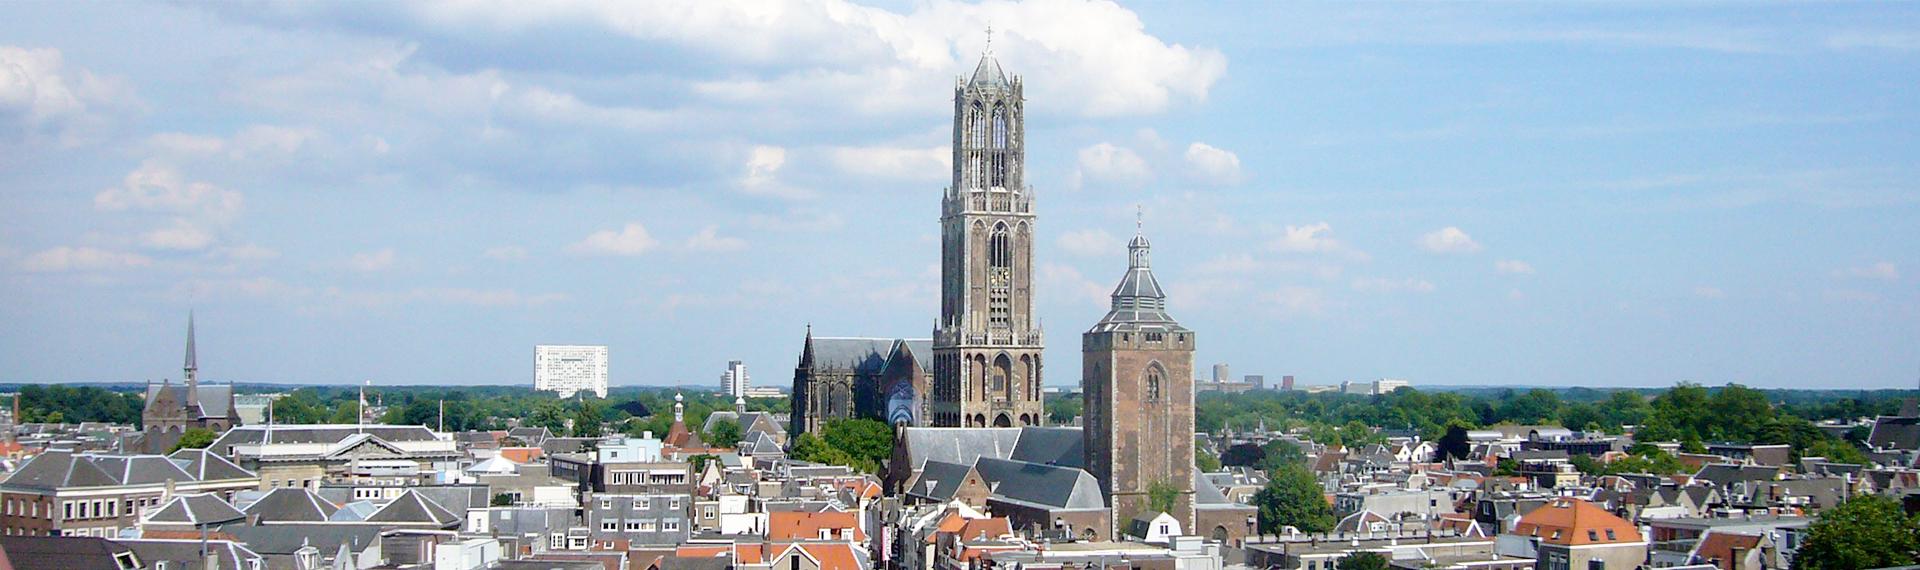 Panorama_Utrecht.jpg